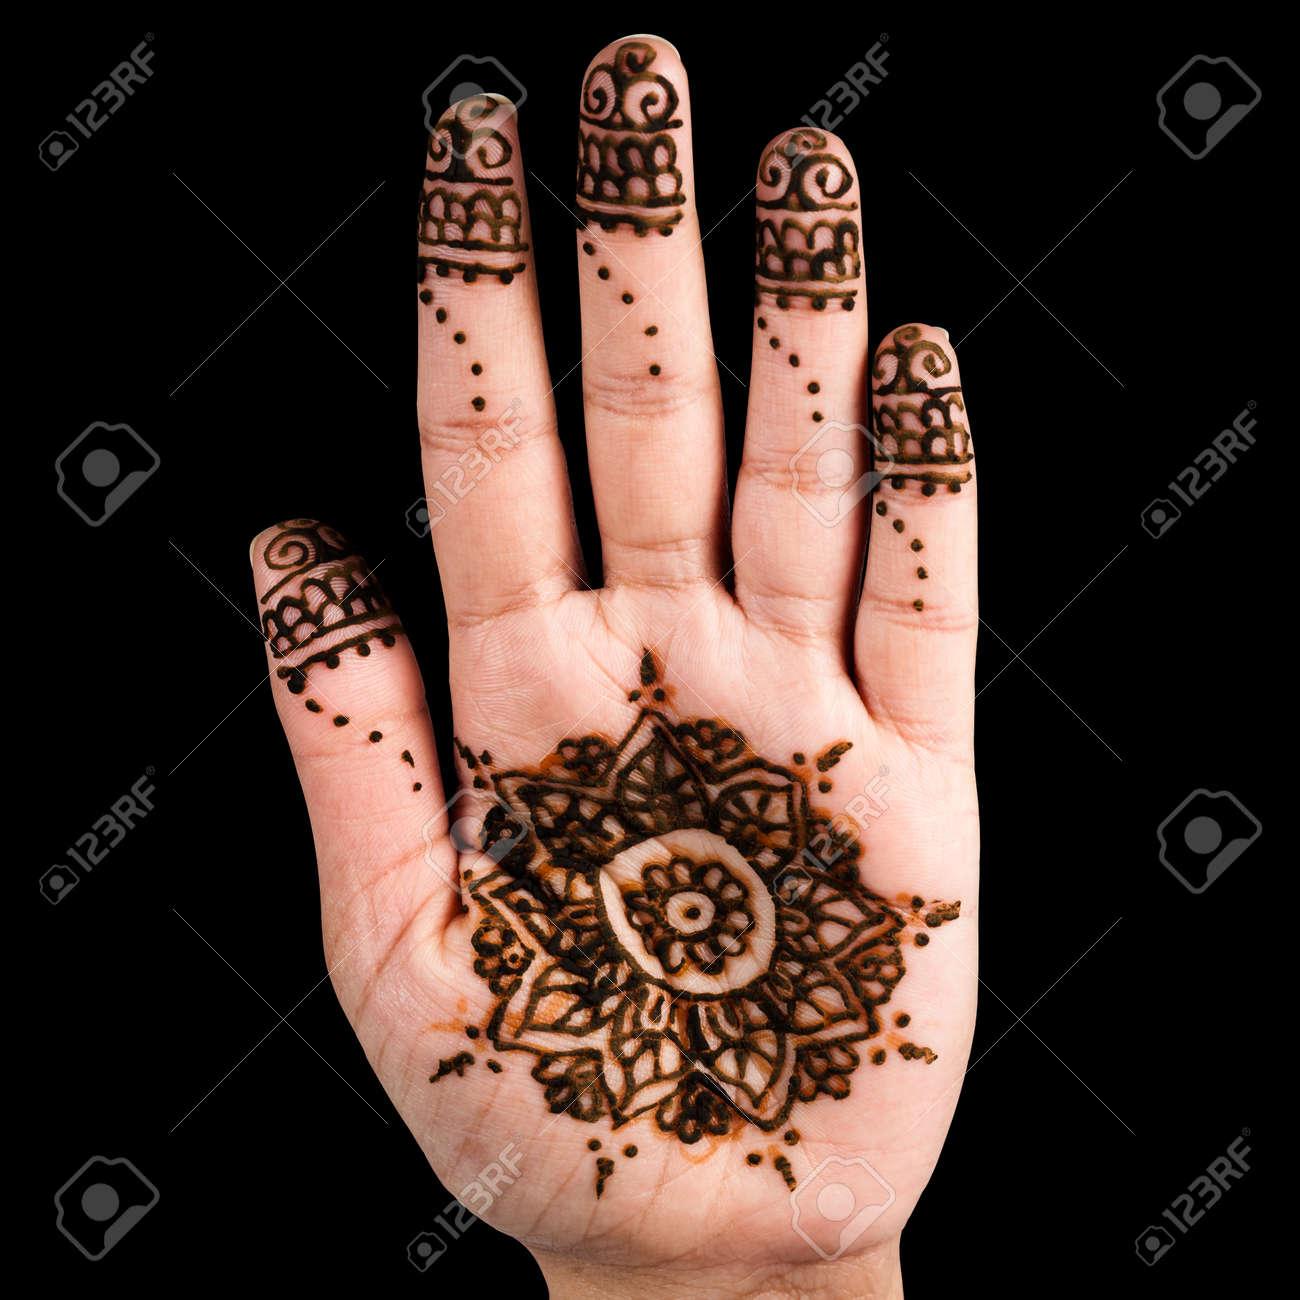 Henna Hand Tattoo Decoration Art Clipping Path Square Black